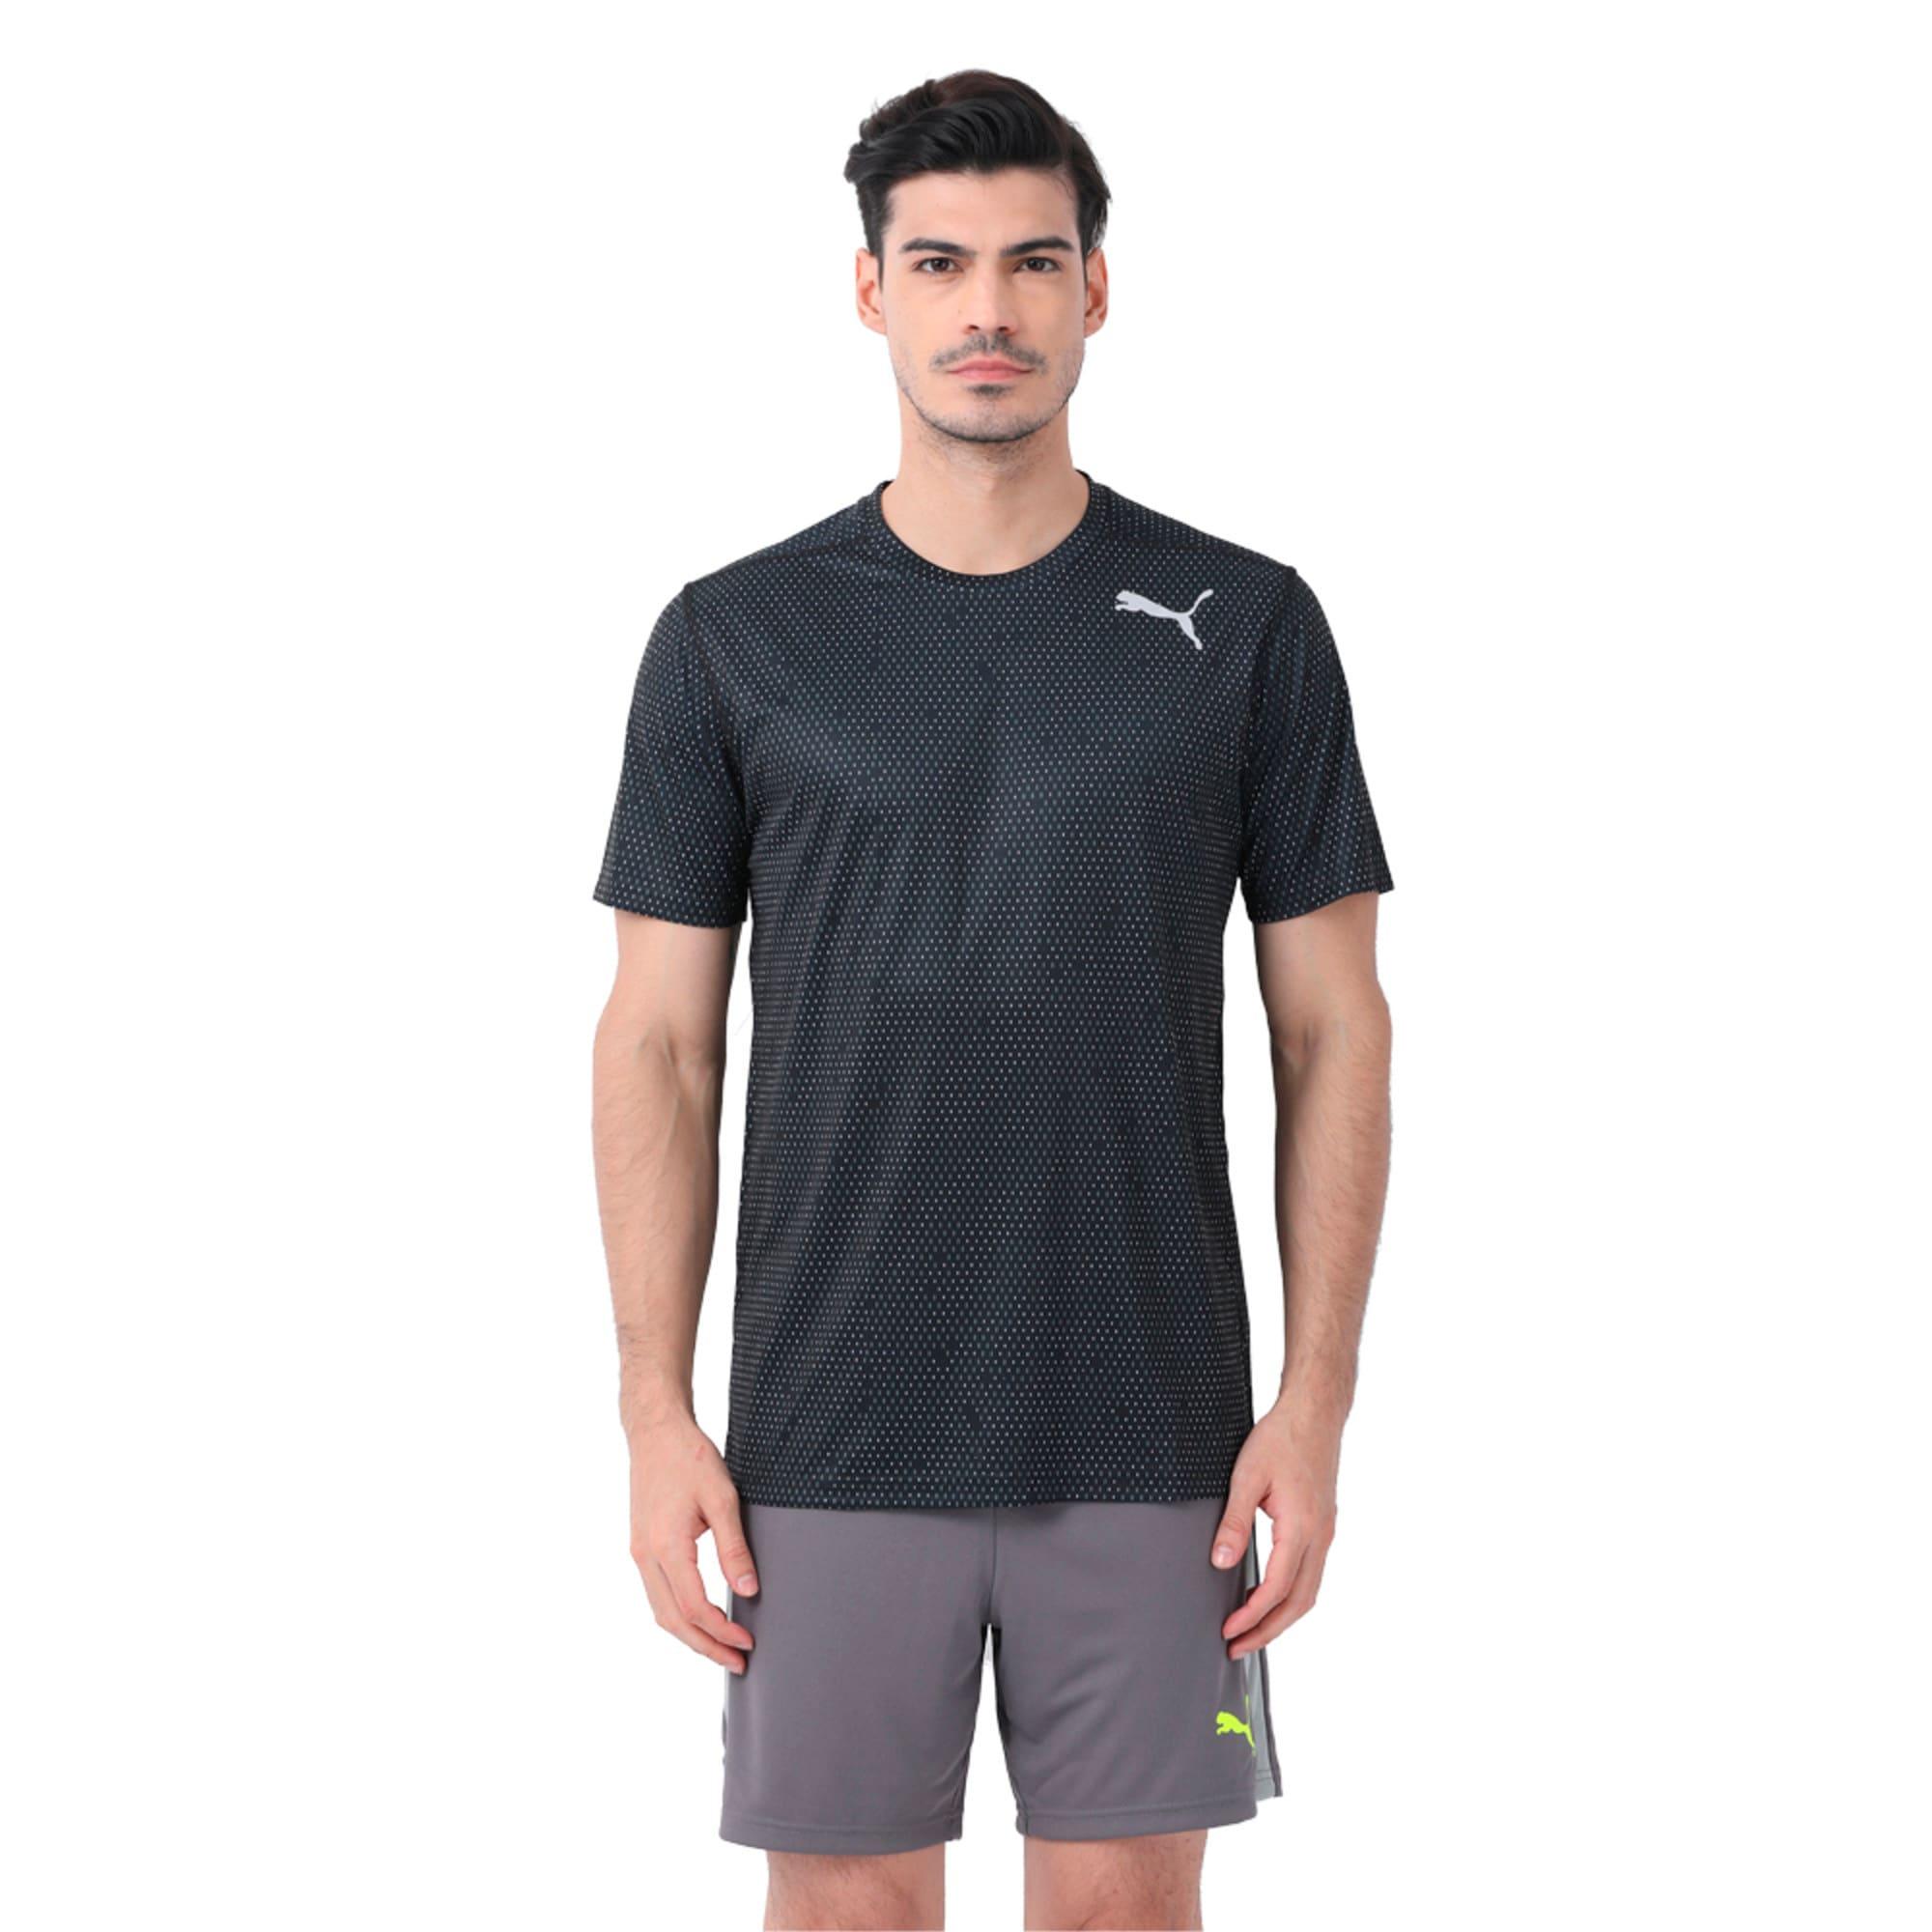 Thumbnail 1 of Training Men's Tech Graphic T-Shirt, puma black-Q3, medium-IND